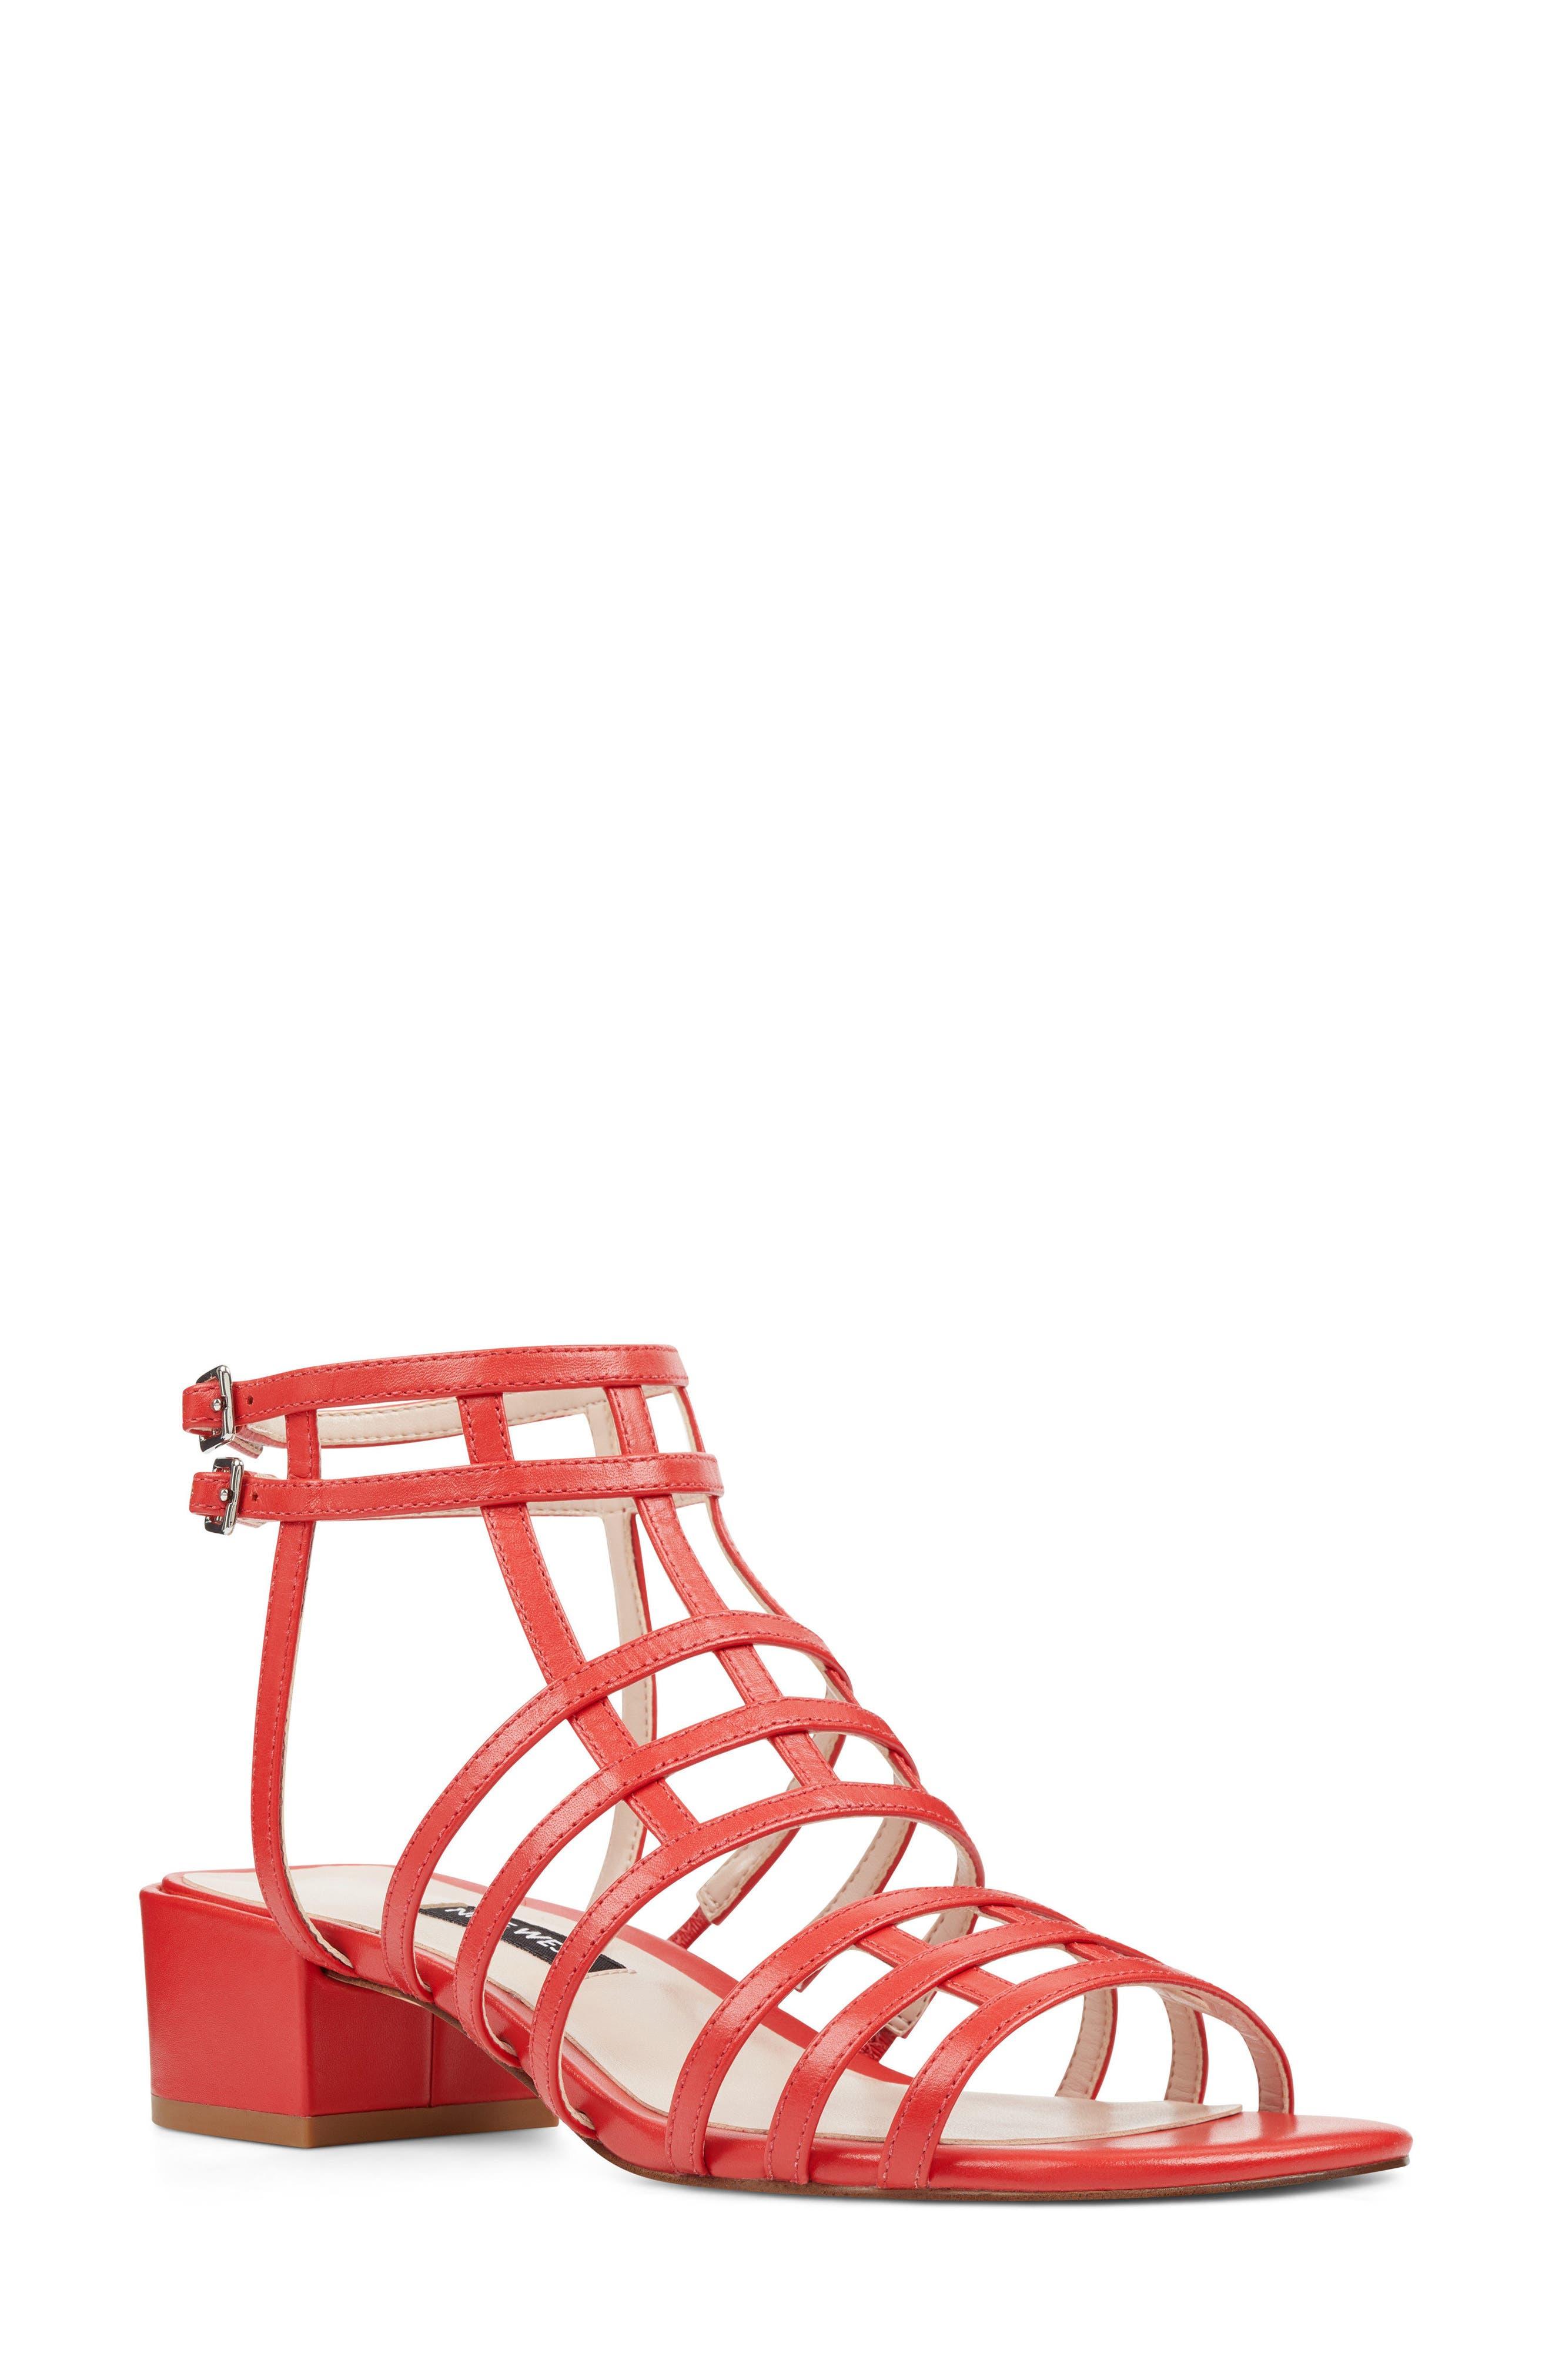 Xerxes Sandal,                             Main thumbnail 1, color,                             Red Leather